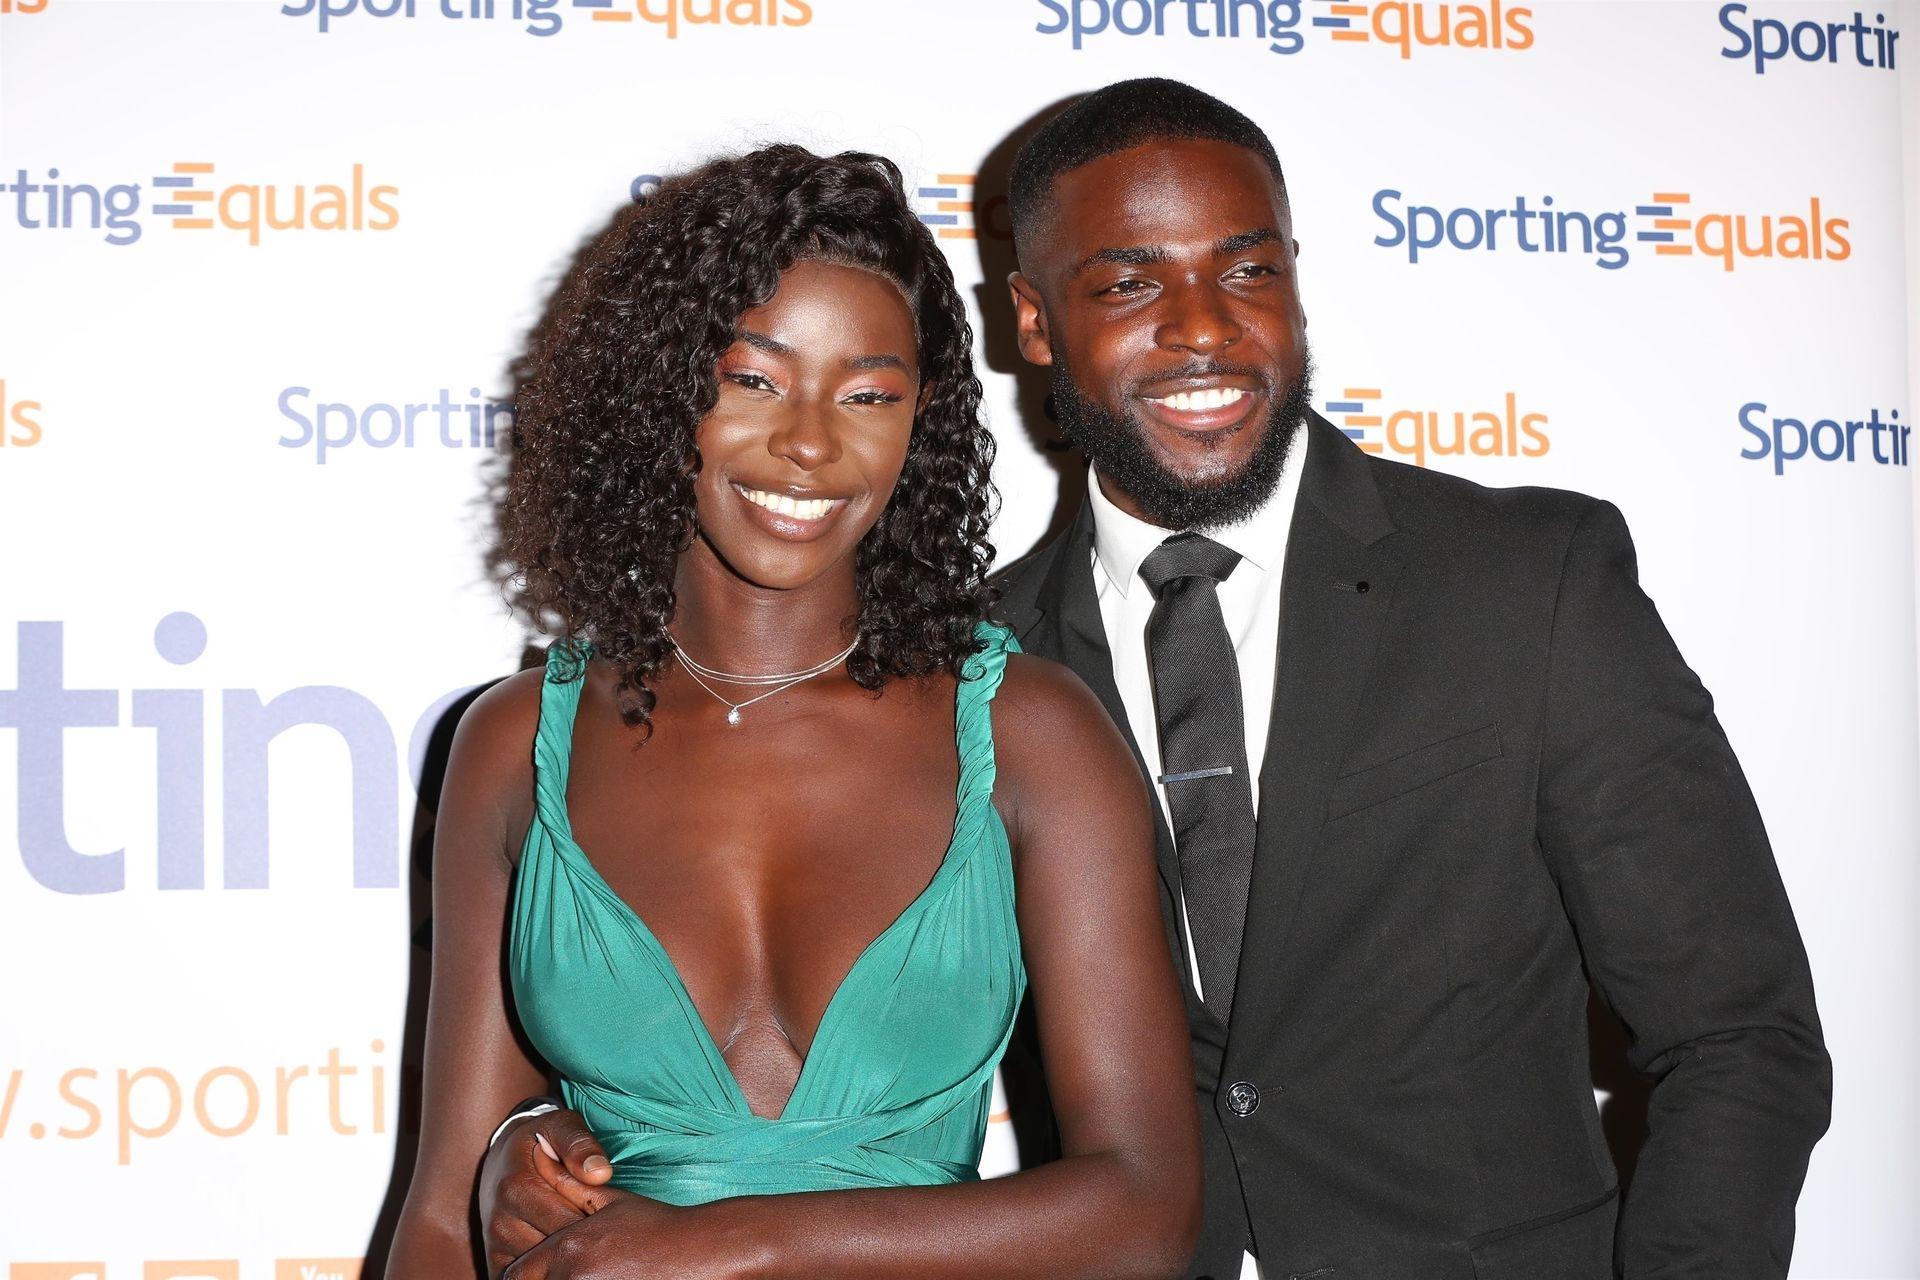 Mike Boateng & Priscilla Anyabu Are Seen At British Ethnic Diversity Sports Awards 0117